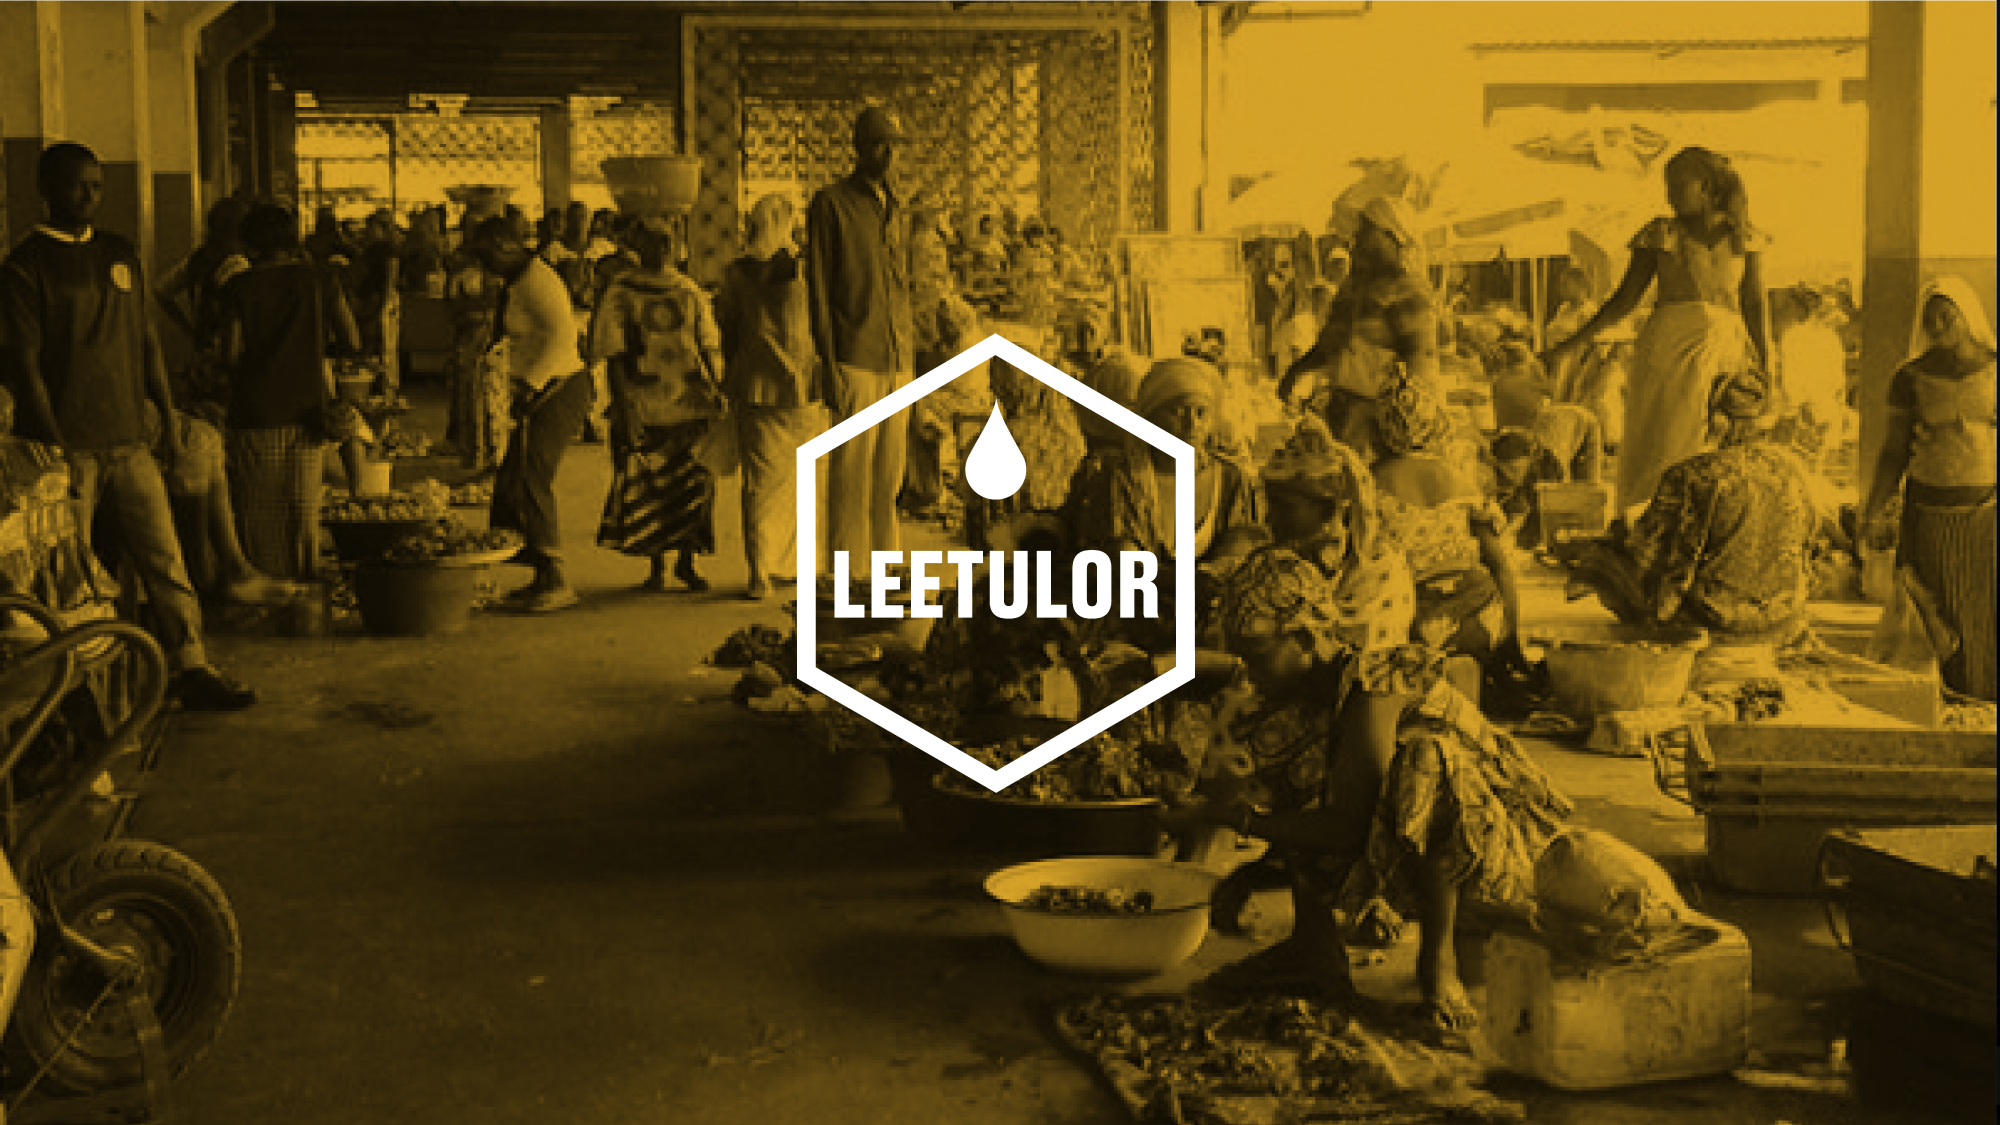 Leetulor_2